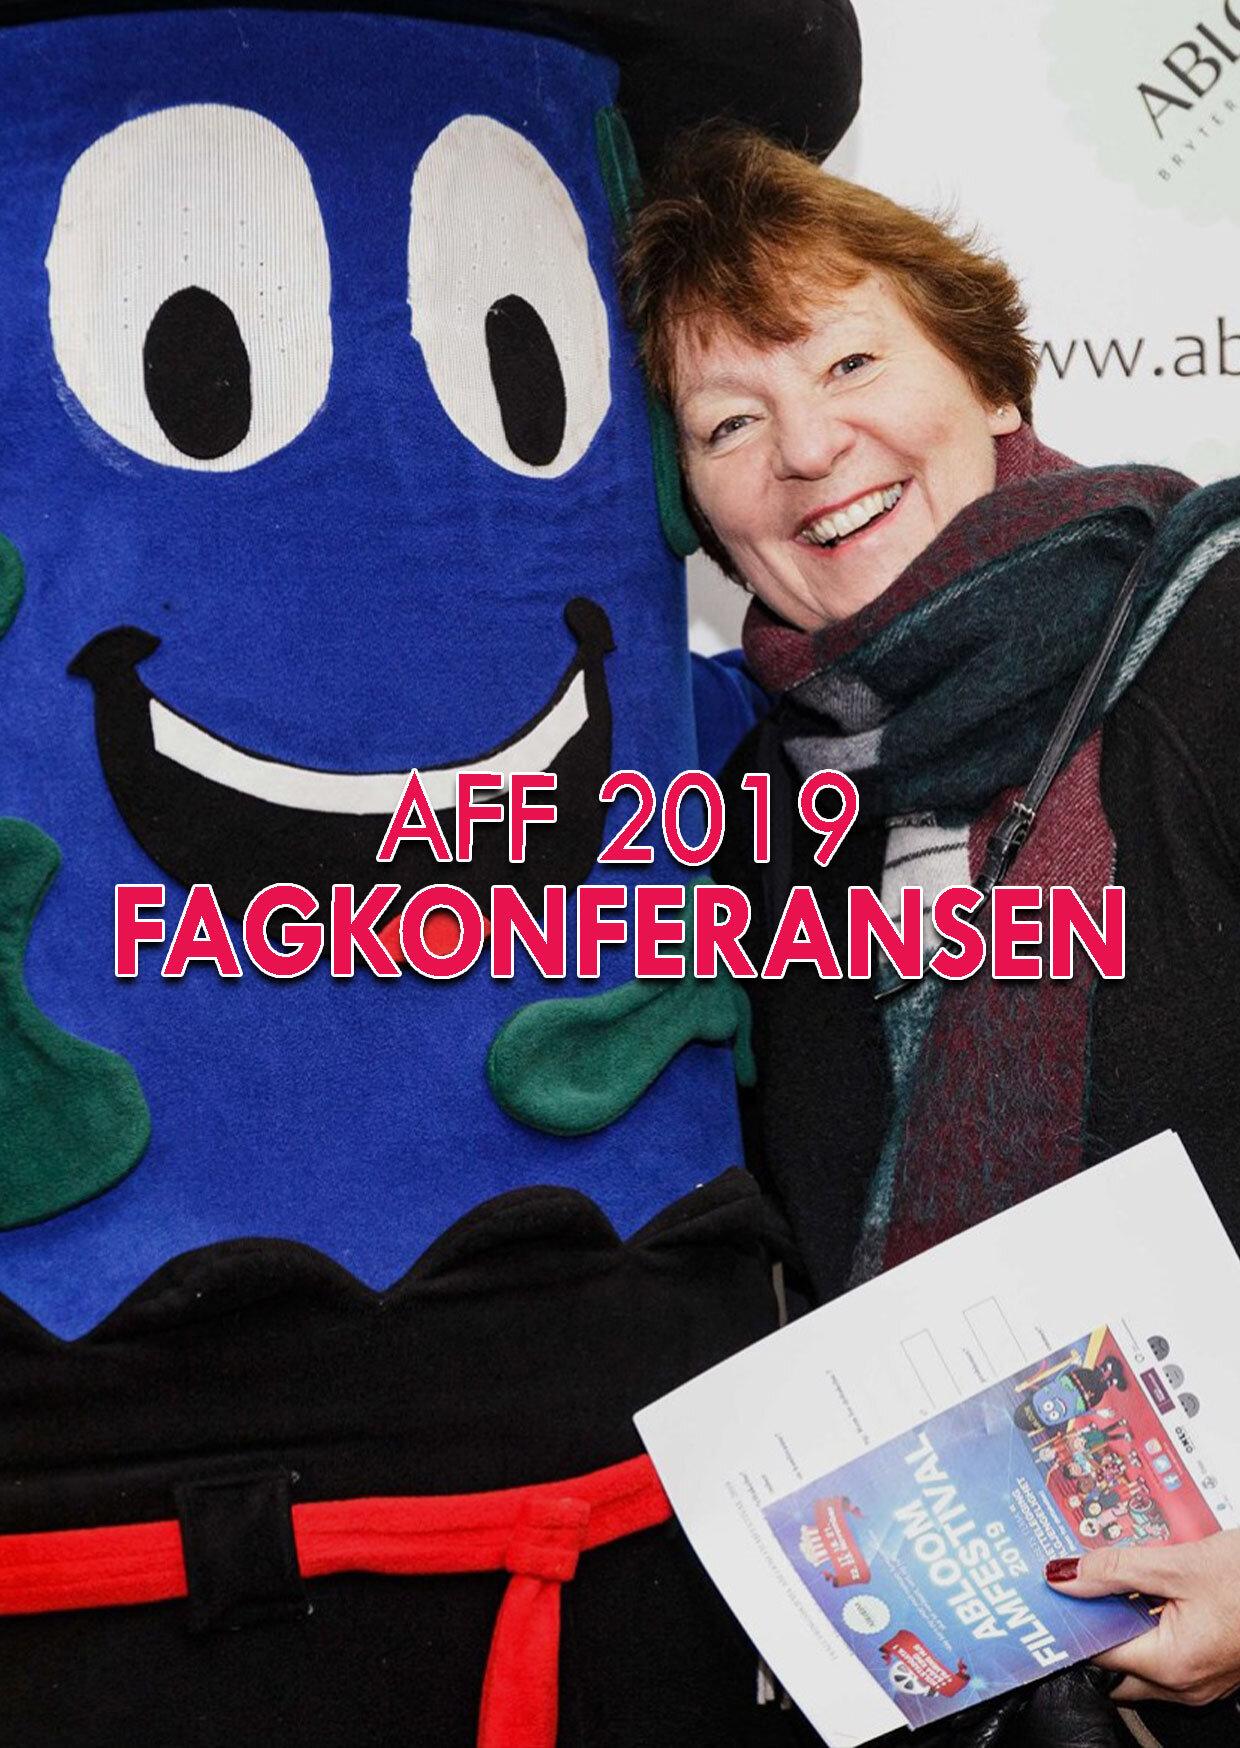 Fagkonferanse 2019